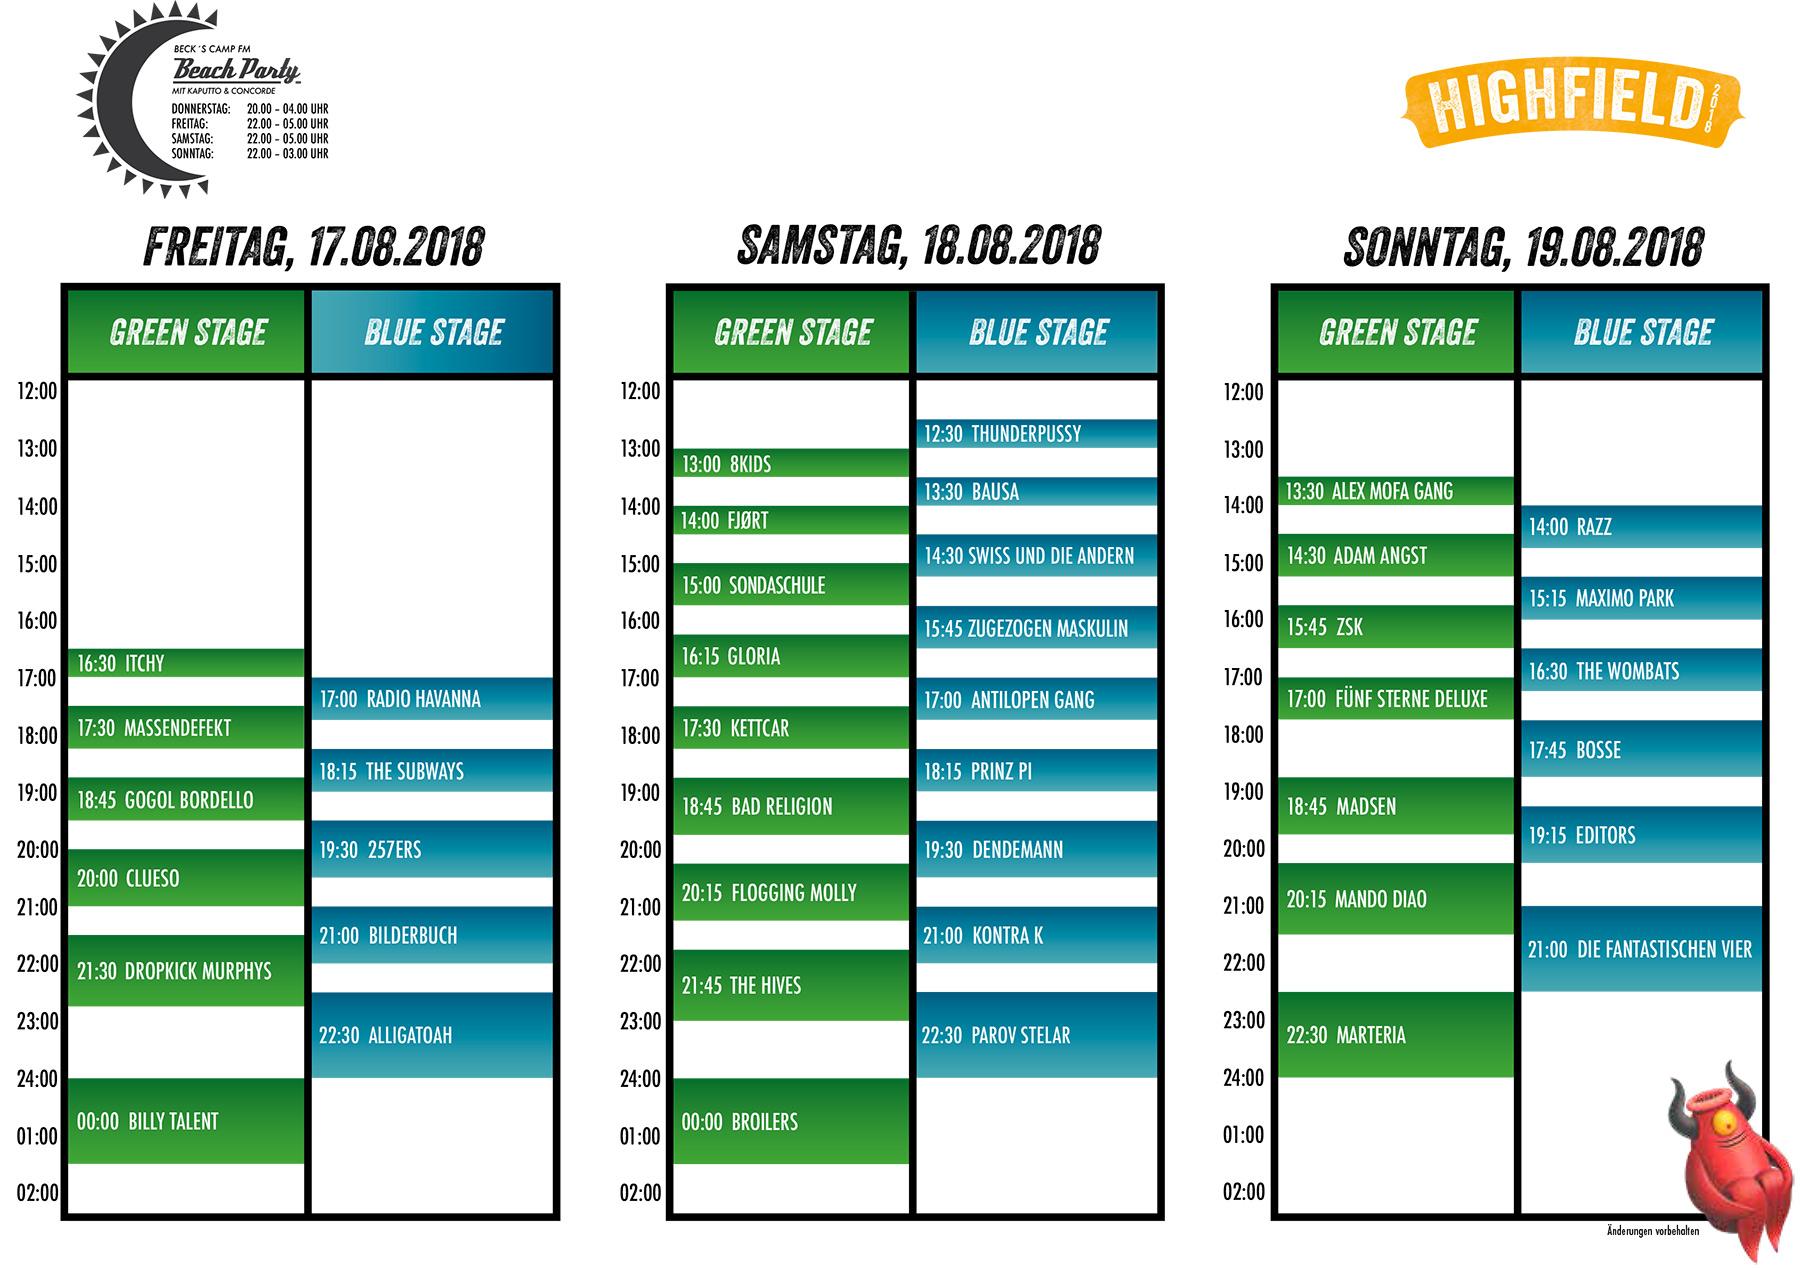 Highfield Timetable 2018